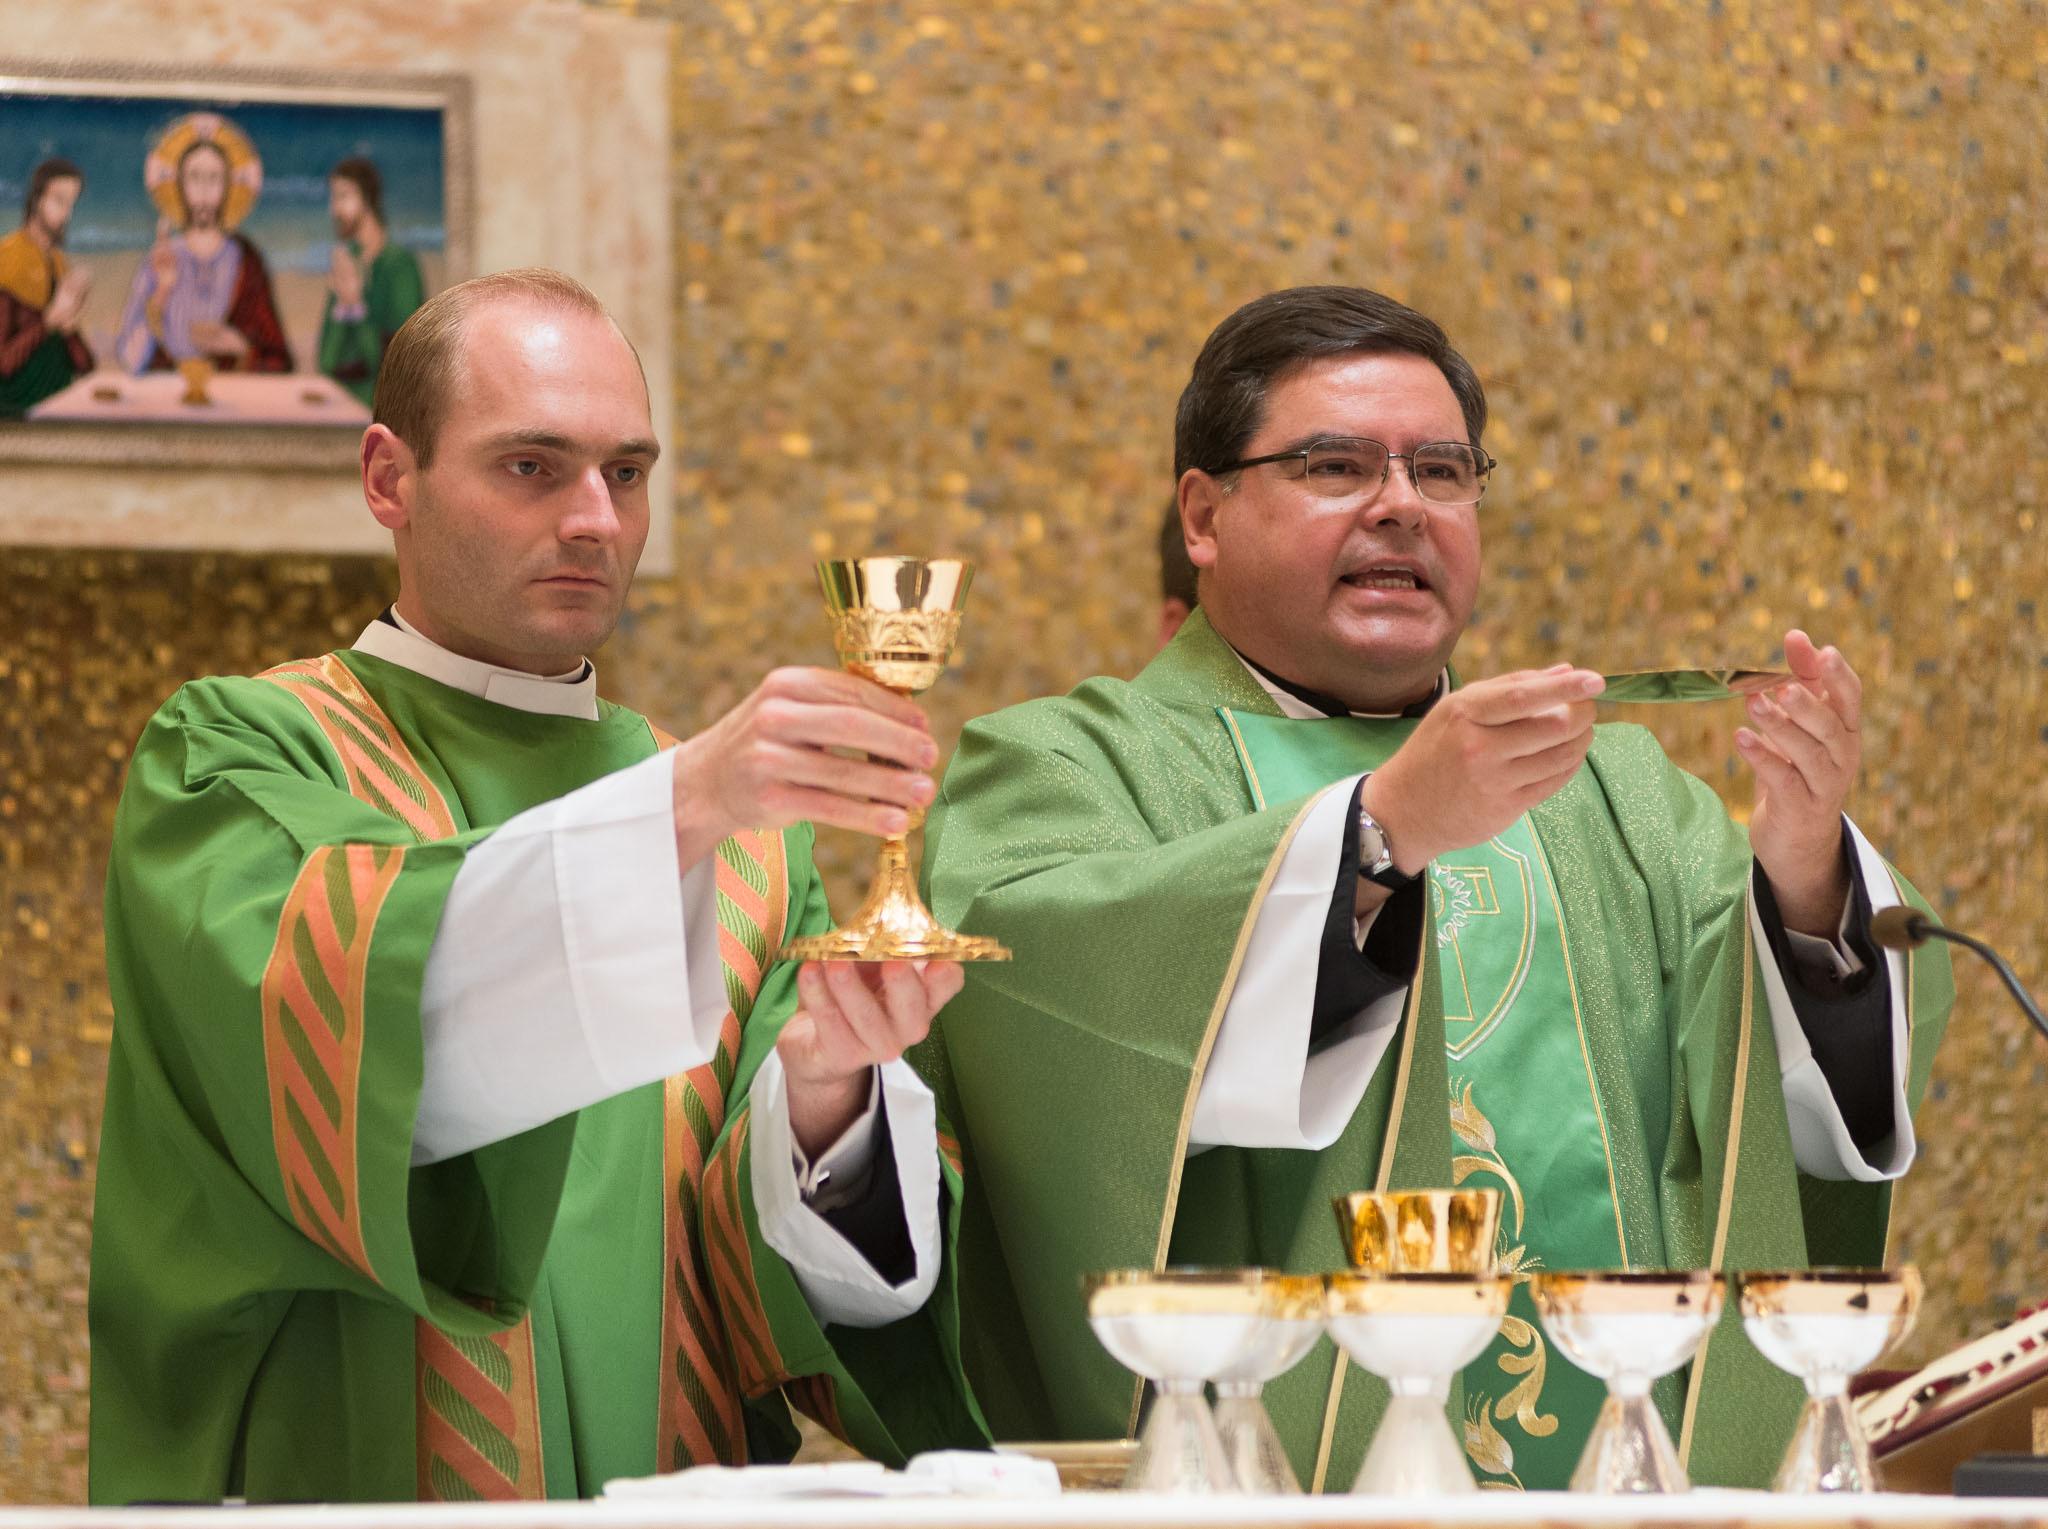 Pater Leonhard Maier